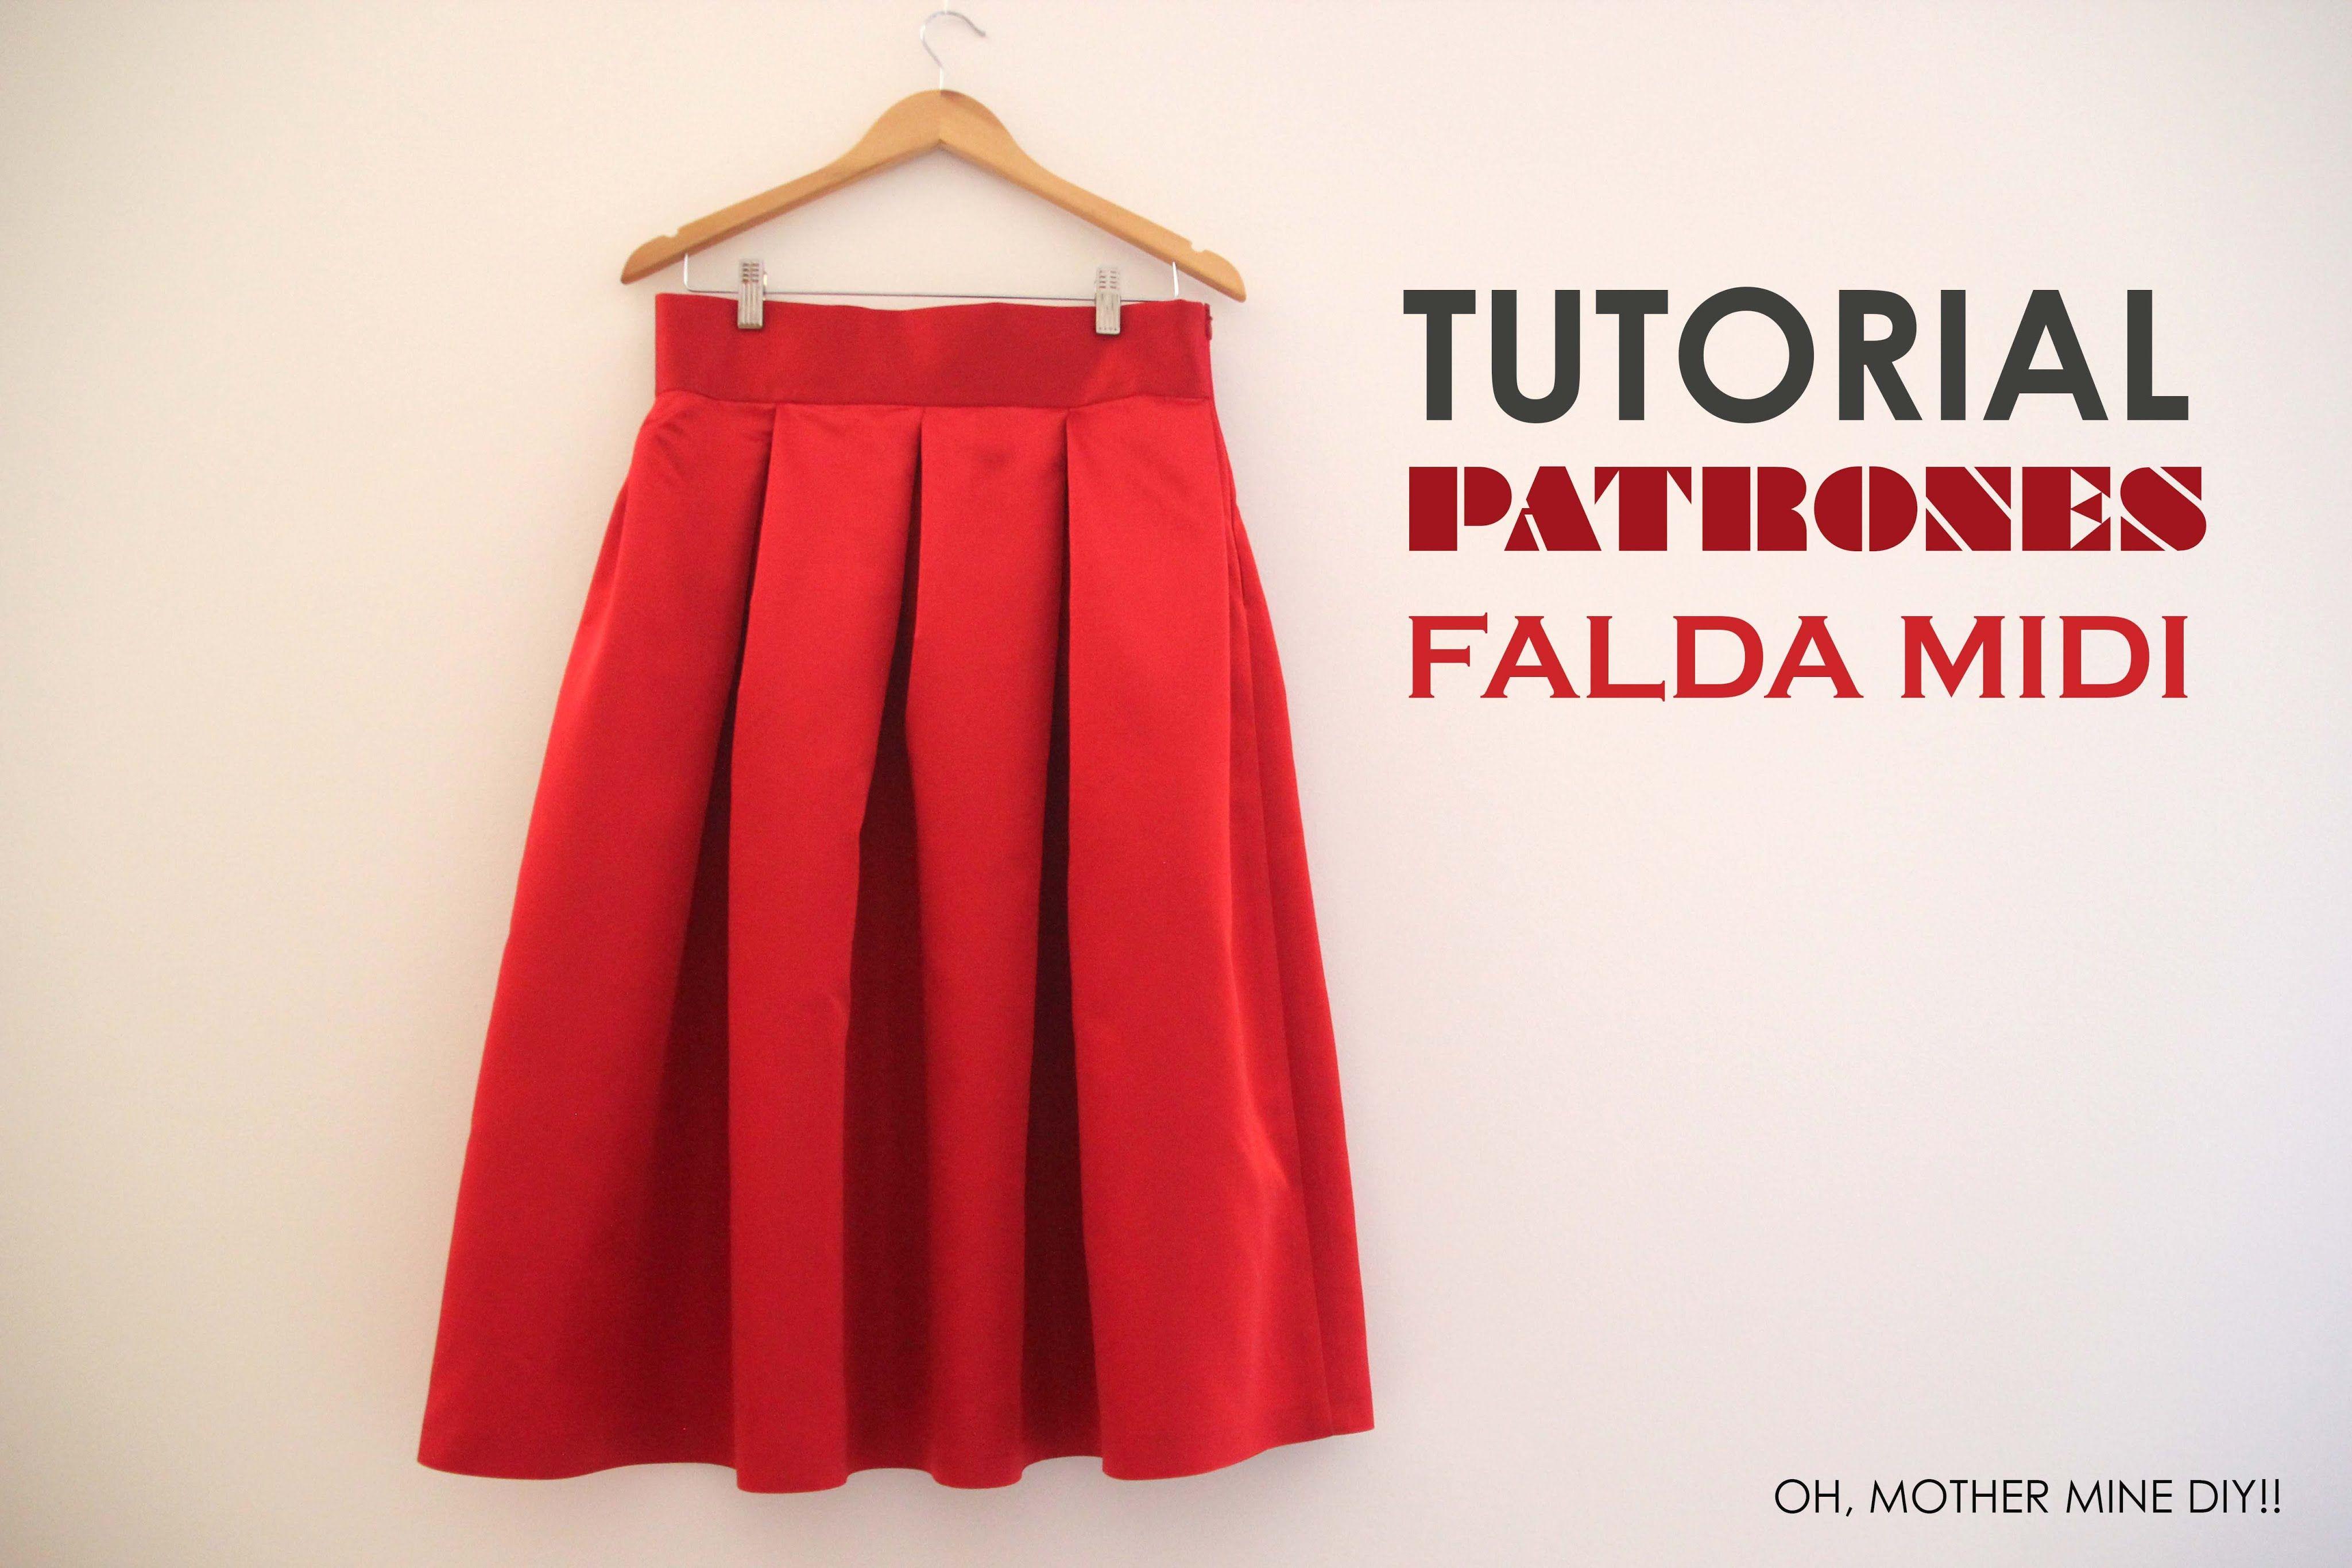 b0642e38a DIY ropa, como hacer tu misma esta falda midi estilo Valentino. La ...